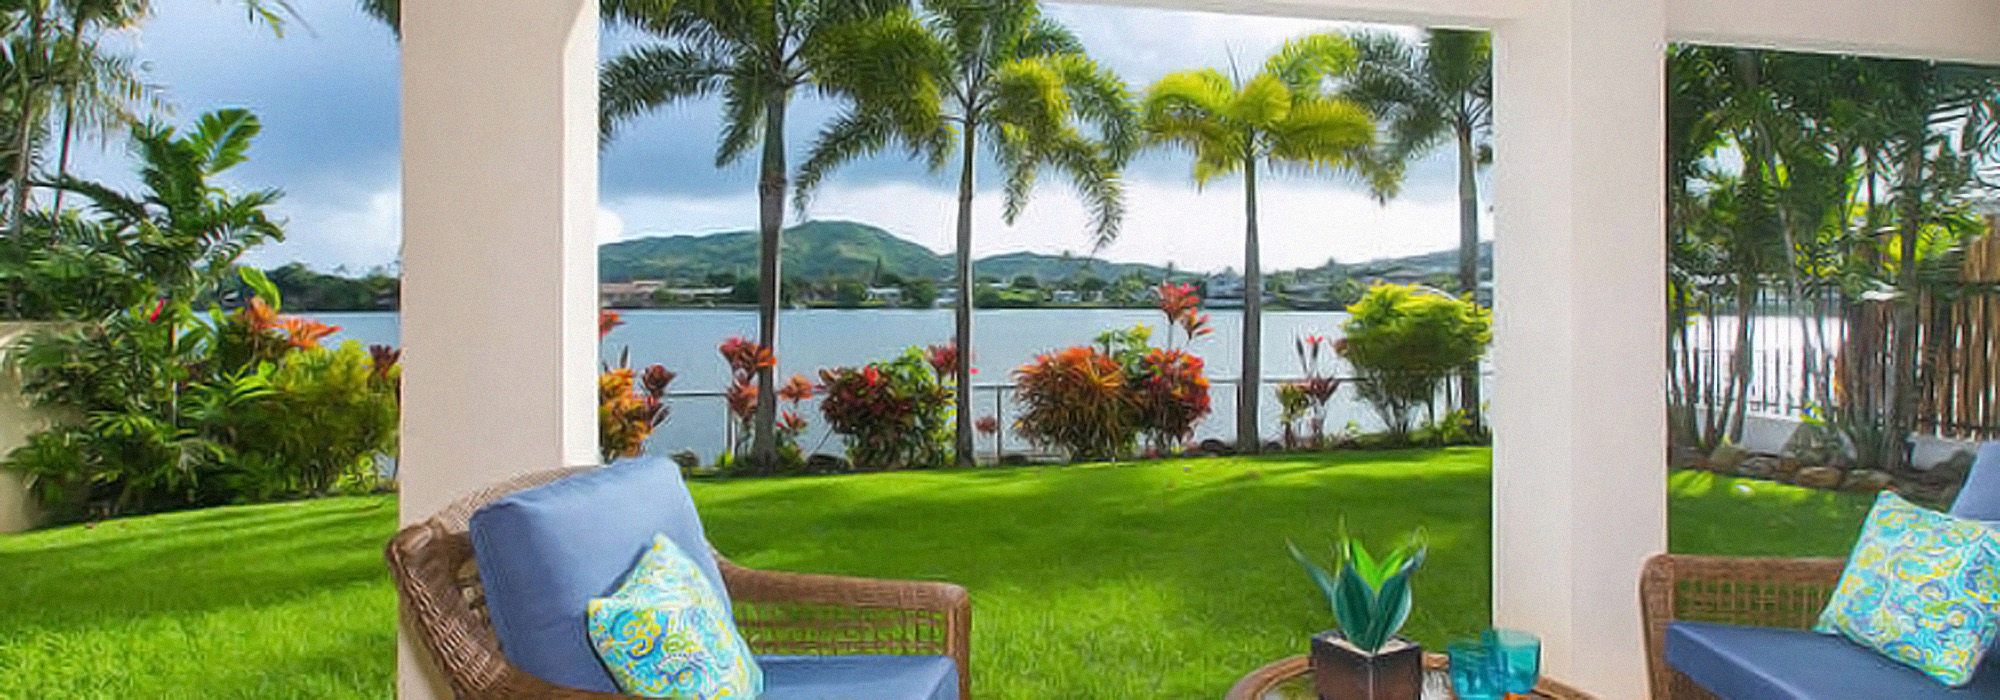 451 Keolu Dr, Kailua